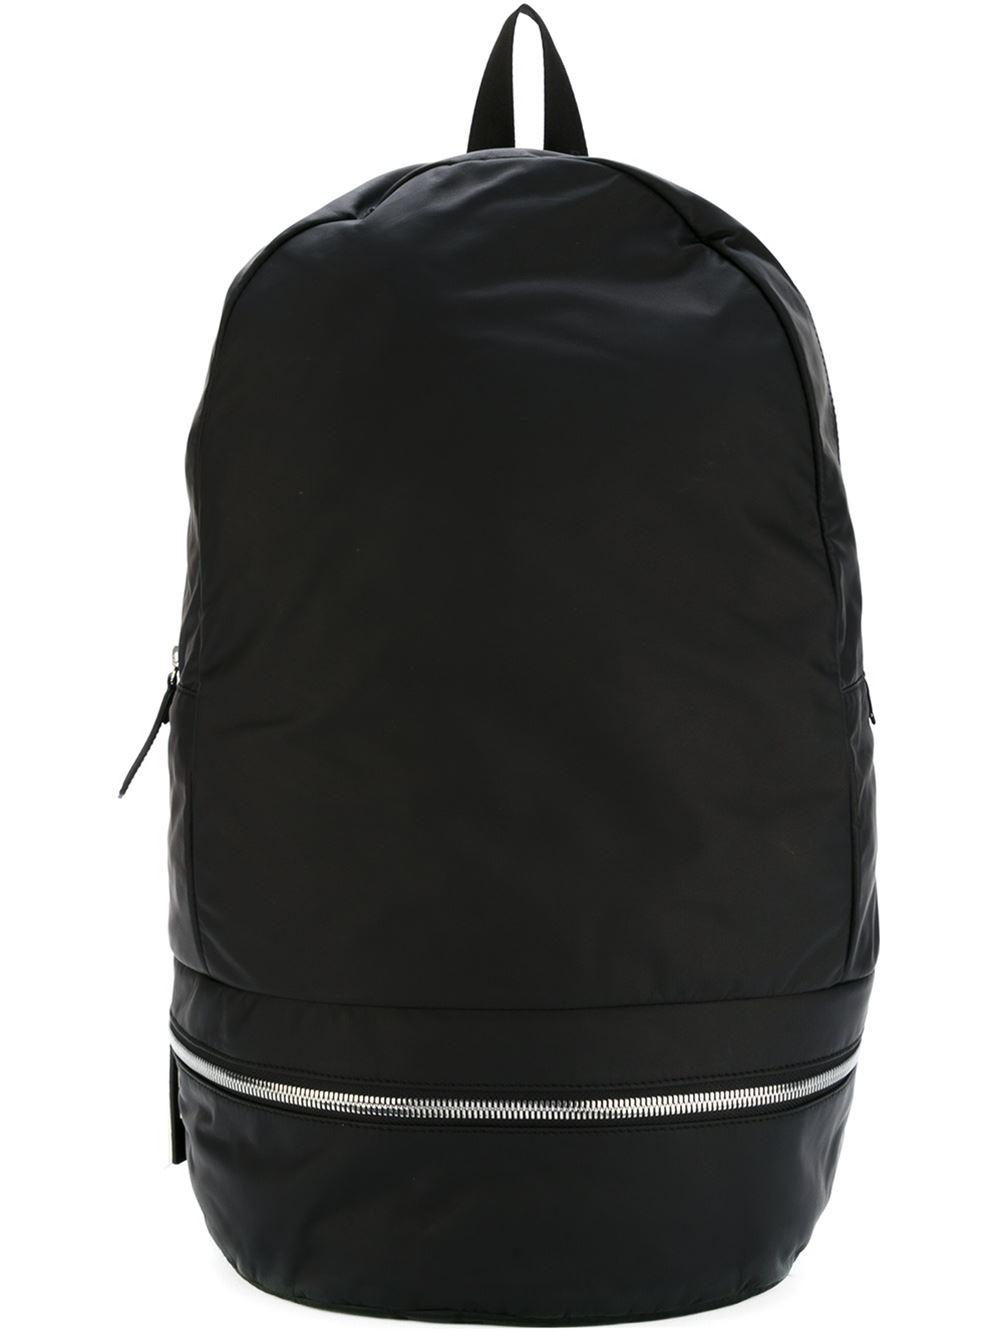 Z Zegna Front Zip Backpack In Black For Men | Lyst